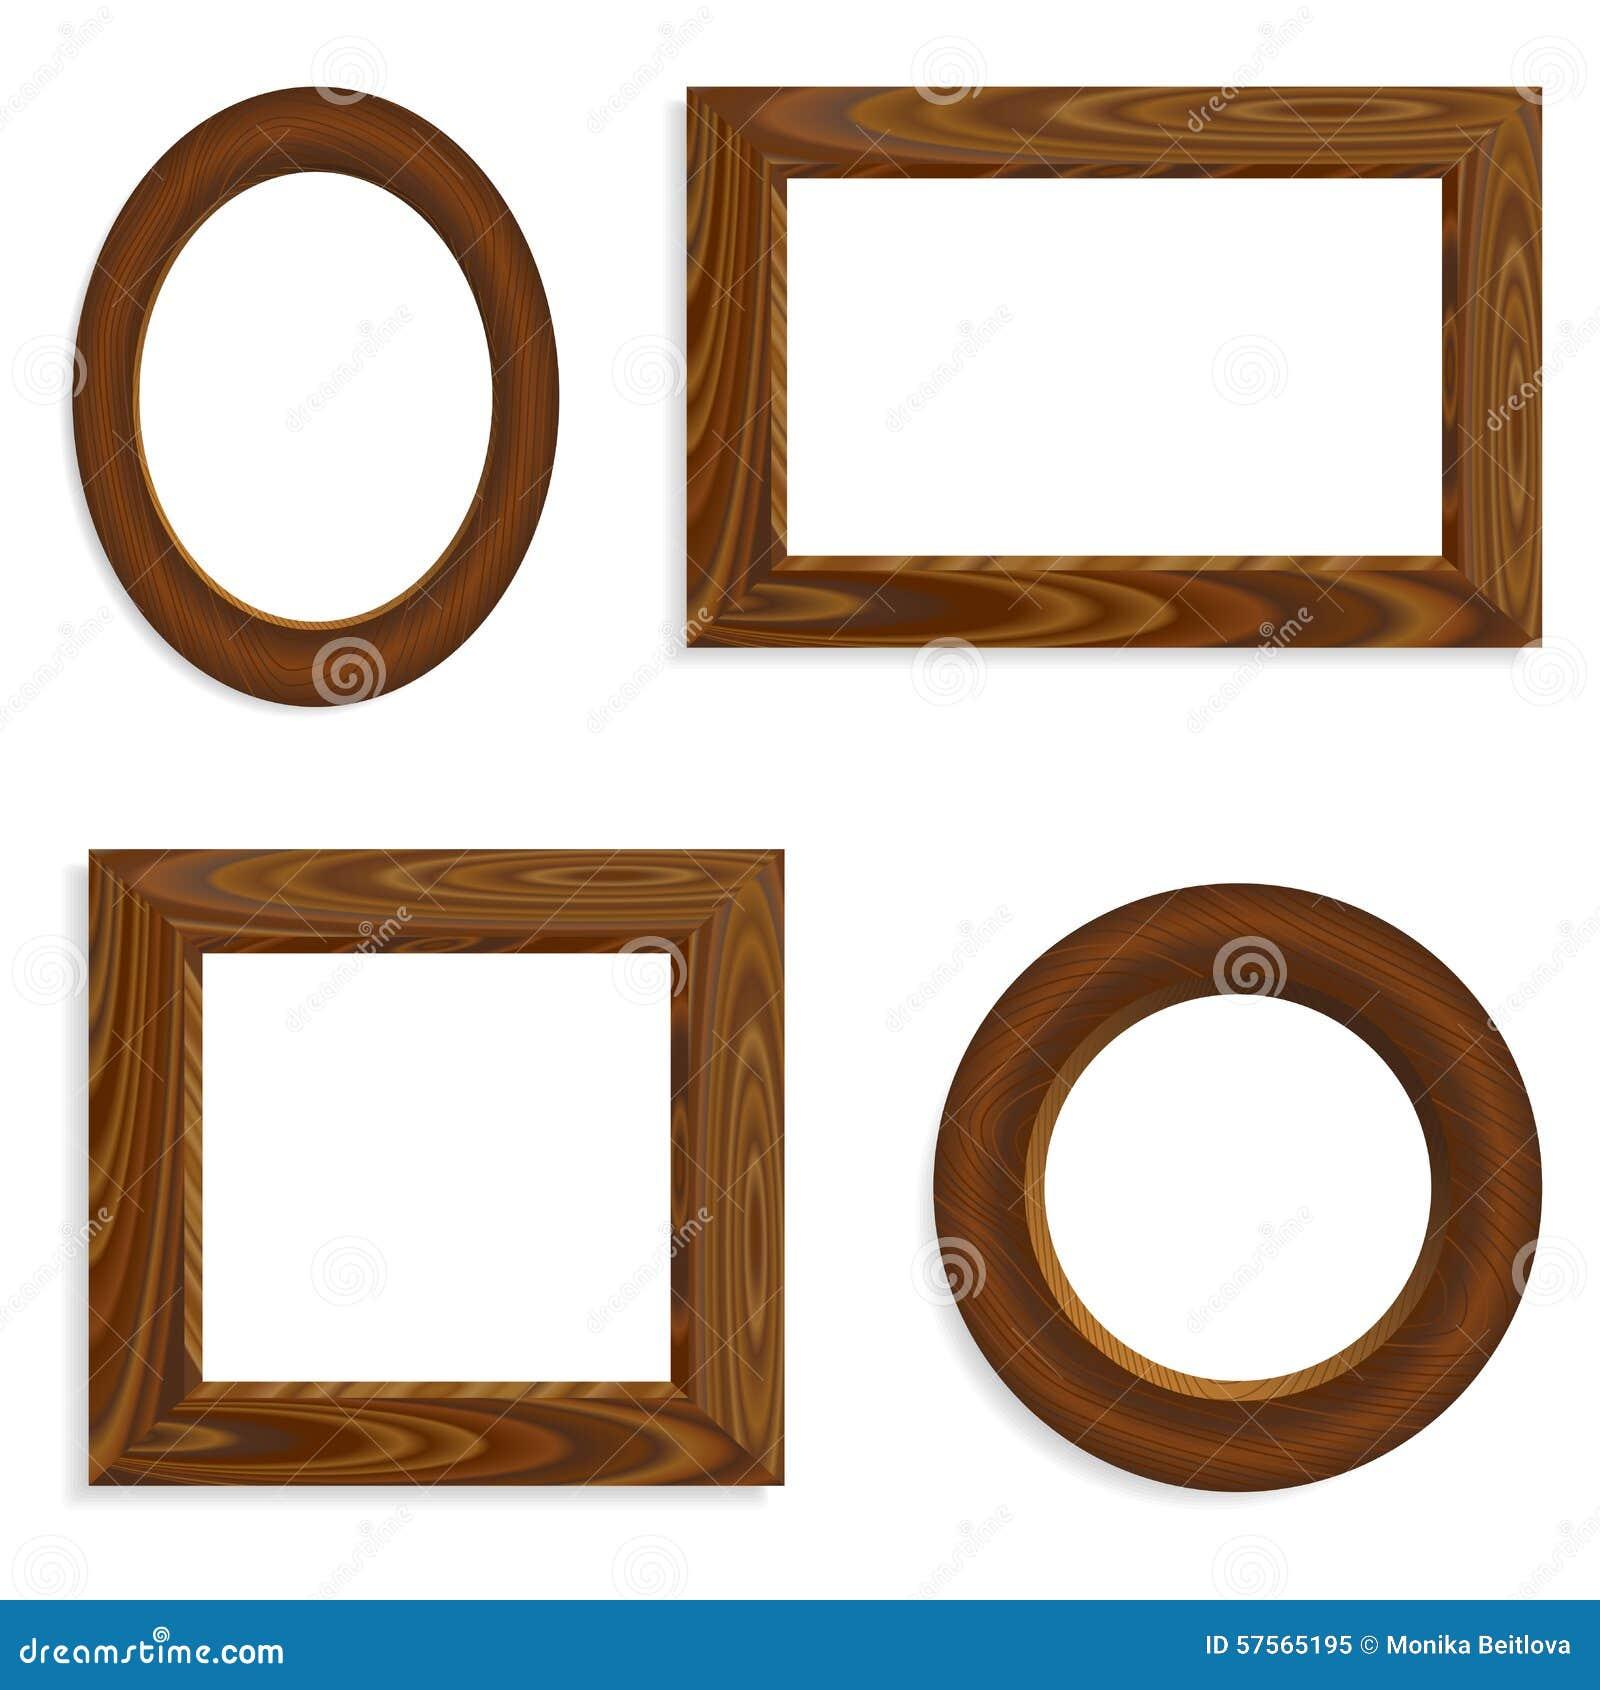 Wood frames set free vector - Royalty Free Vector